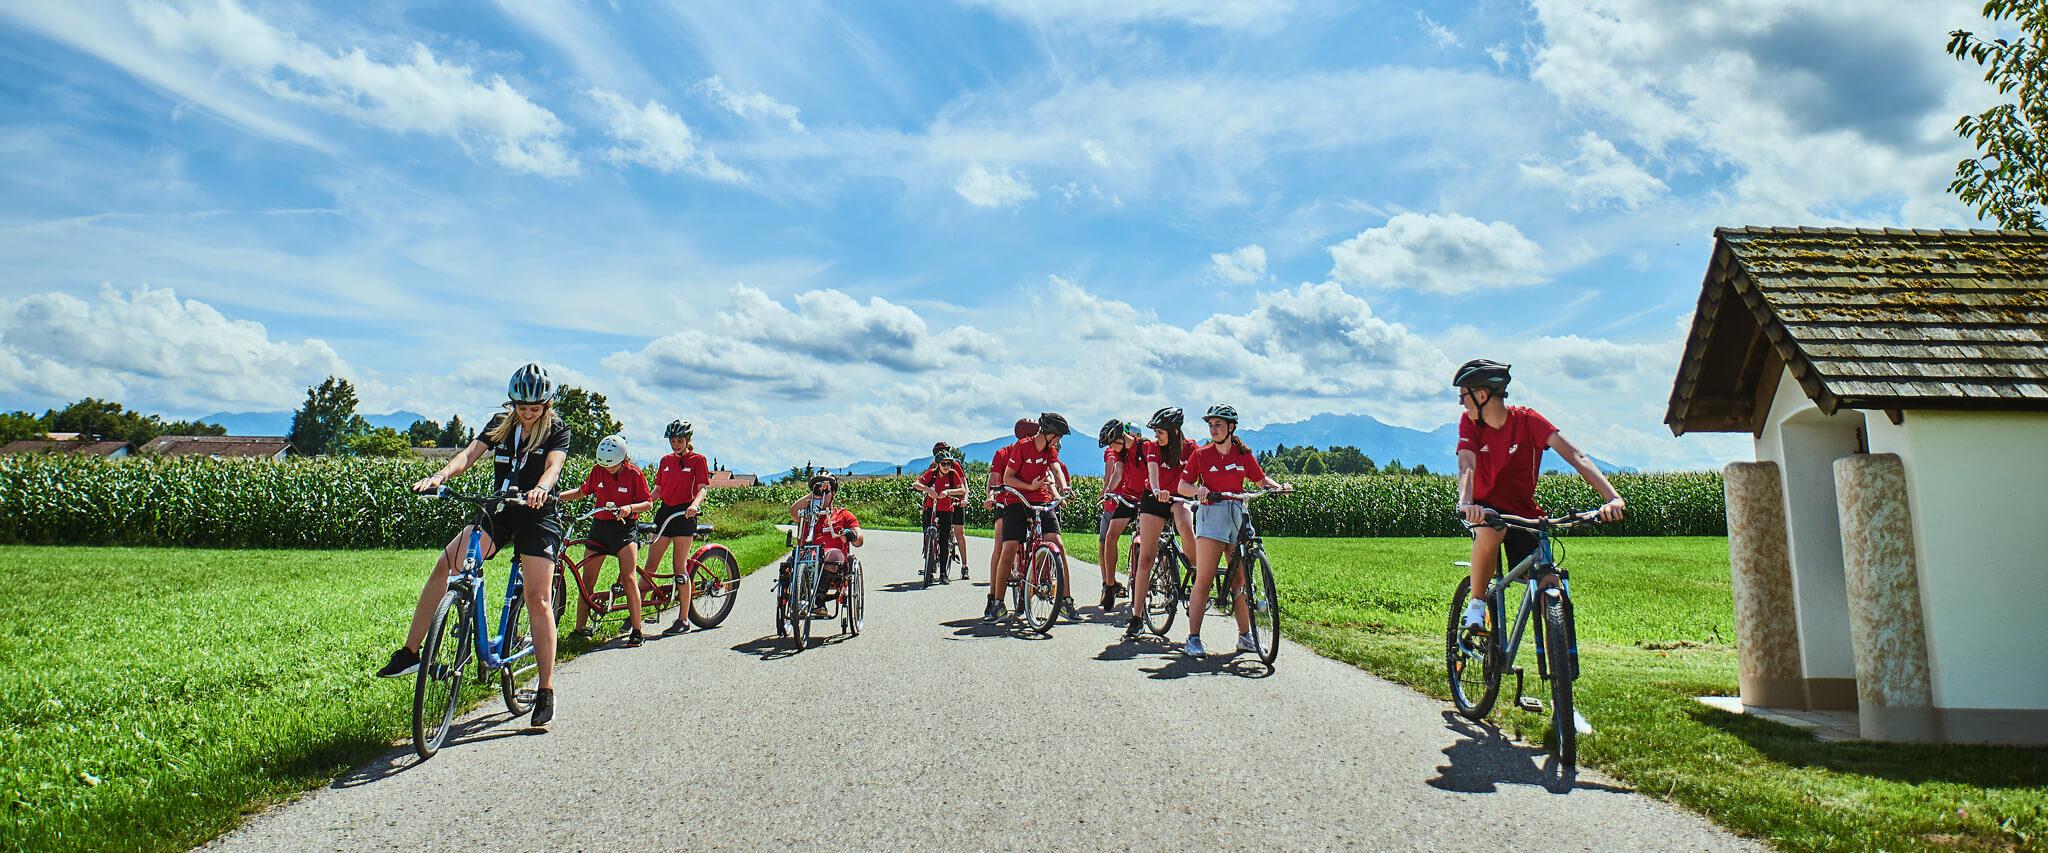 Campteilnehmer auf dem Fahrrad